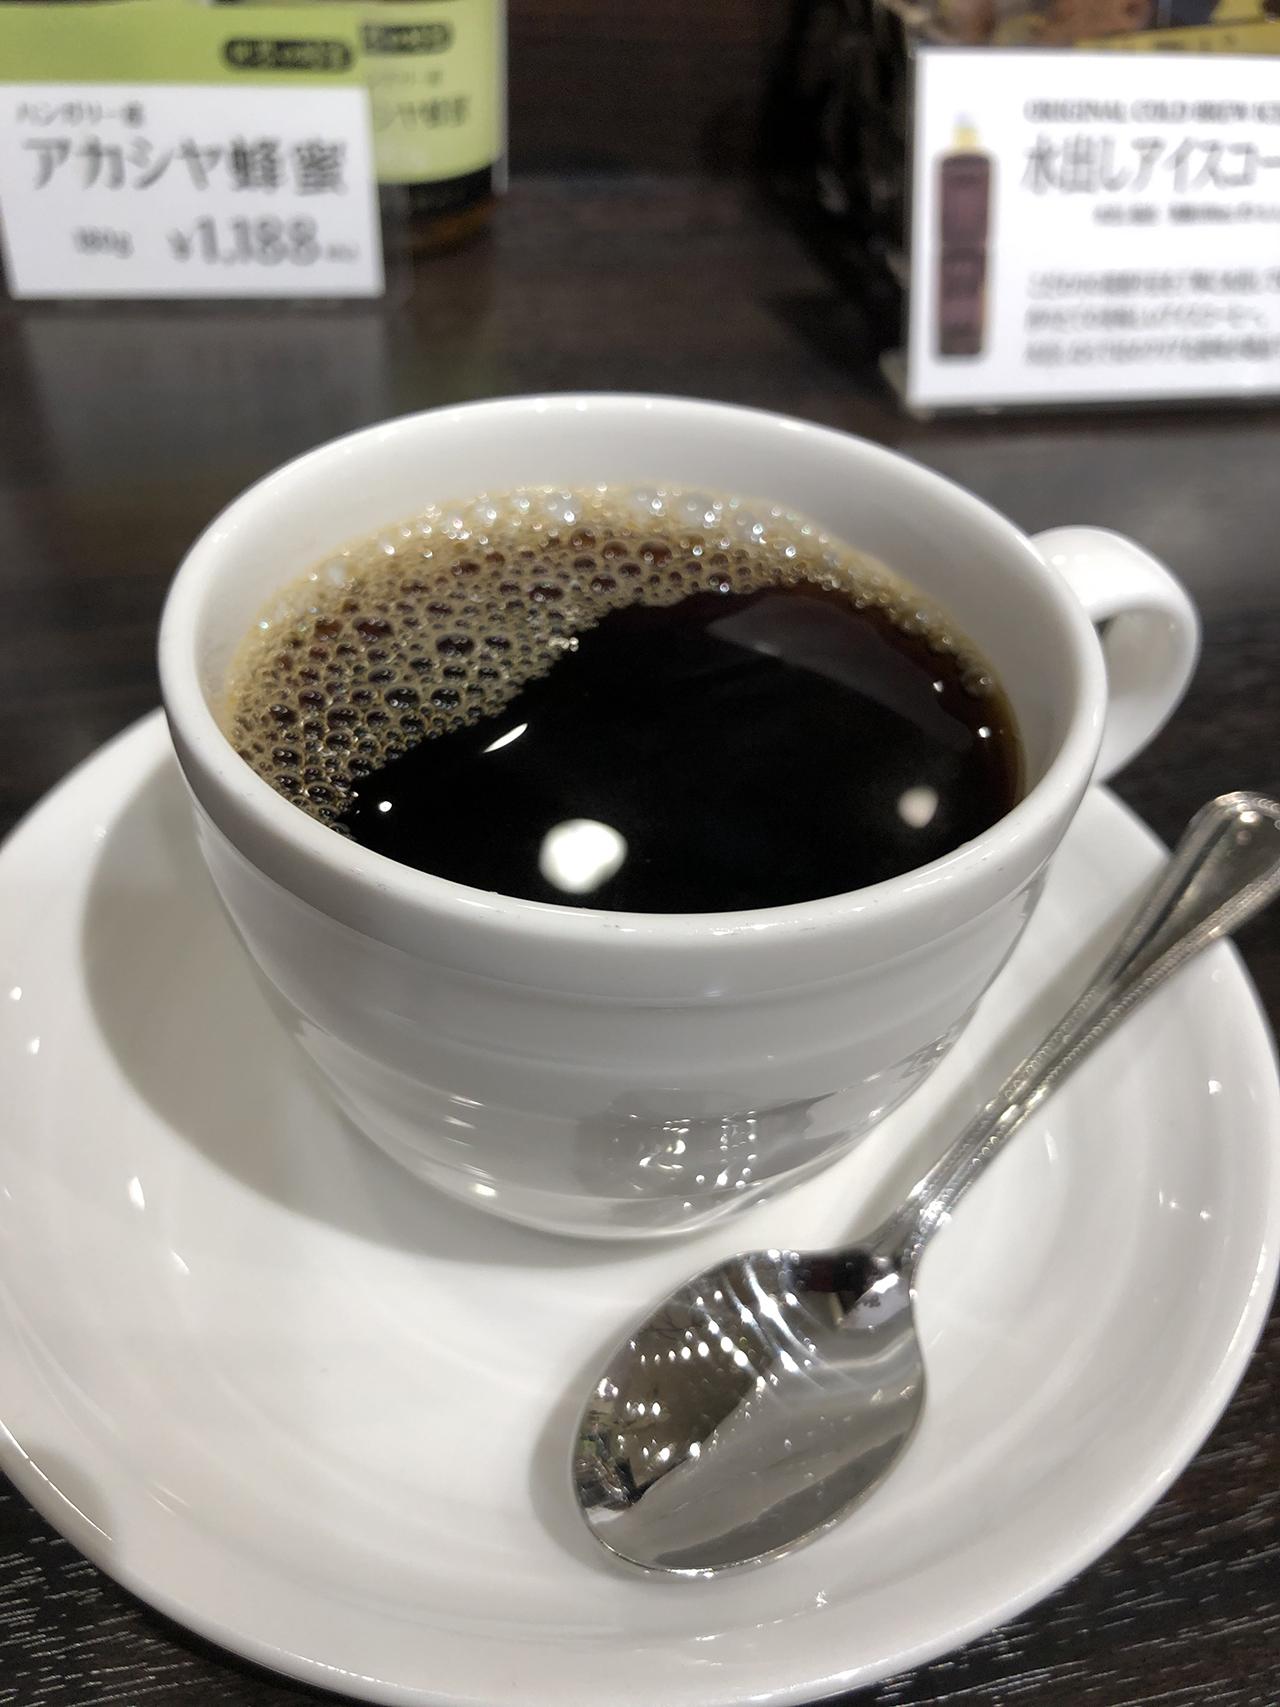 CAMBLEM(キャンブレム) グリーン珈琲焙煎所 モリシア津田沼店の投稿写真6